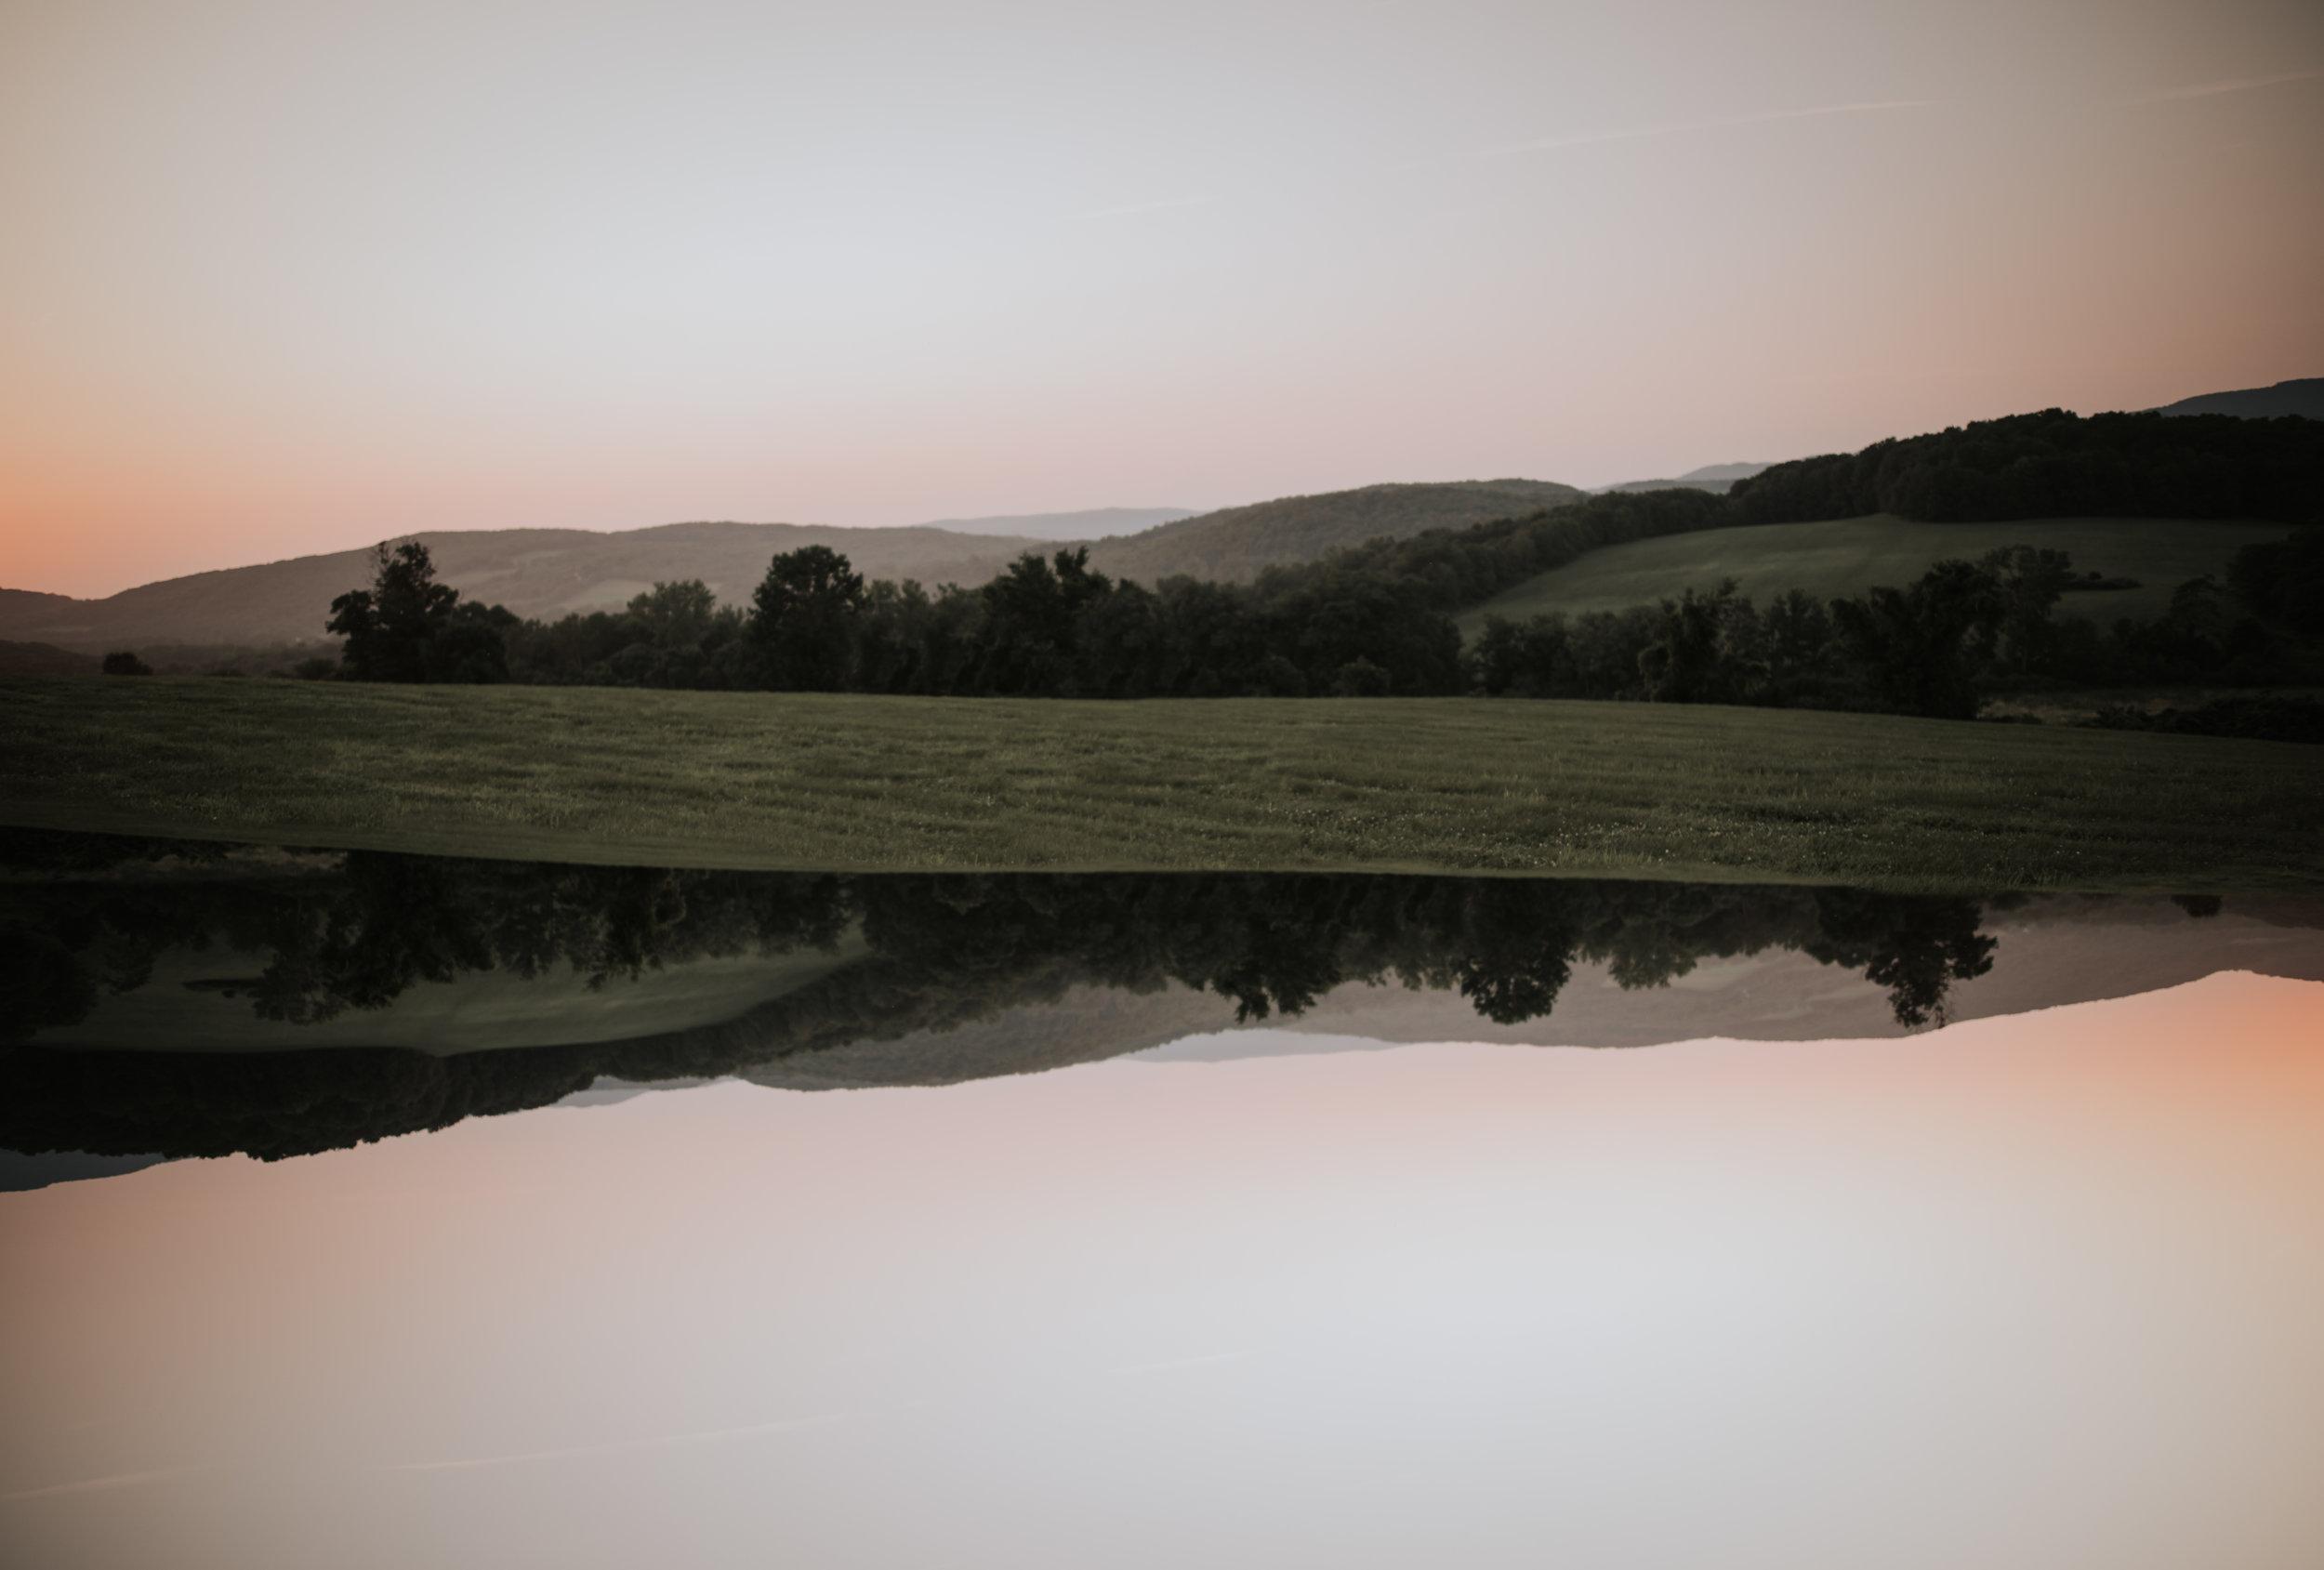 Lorianna Weathers Vermont Photography.jpg